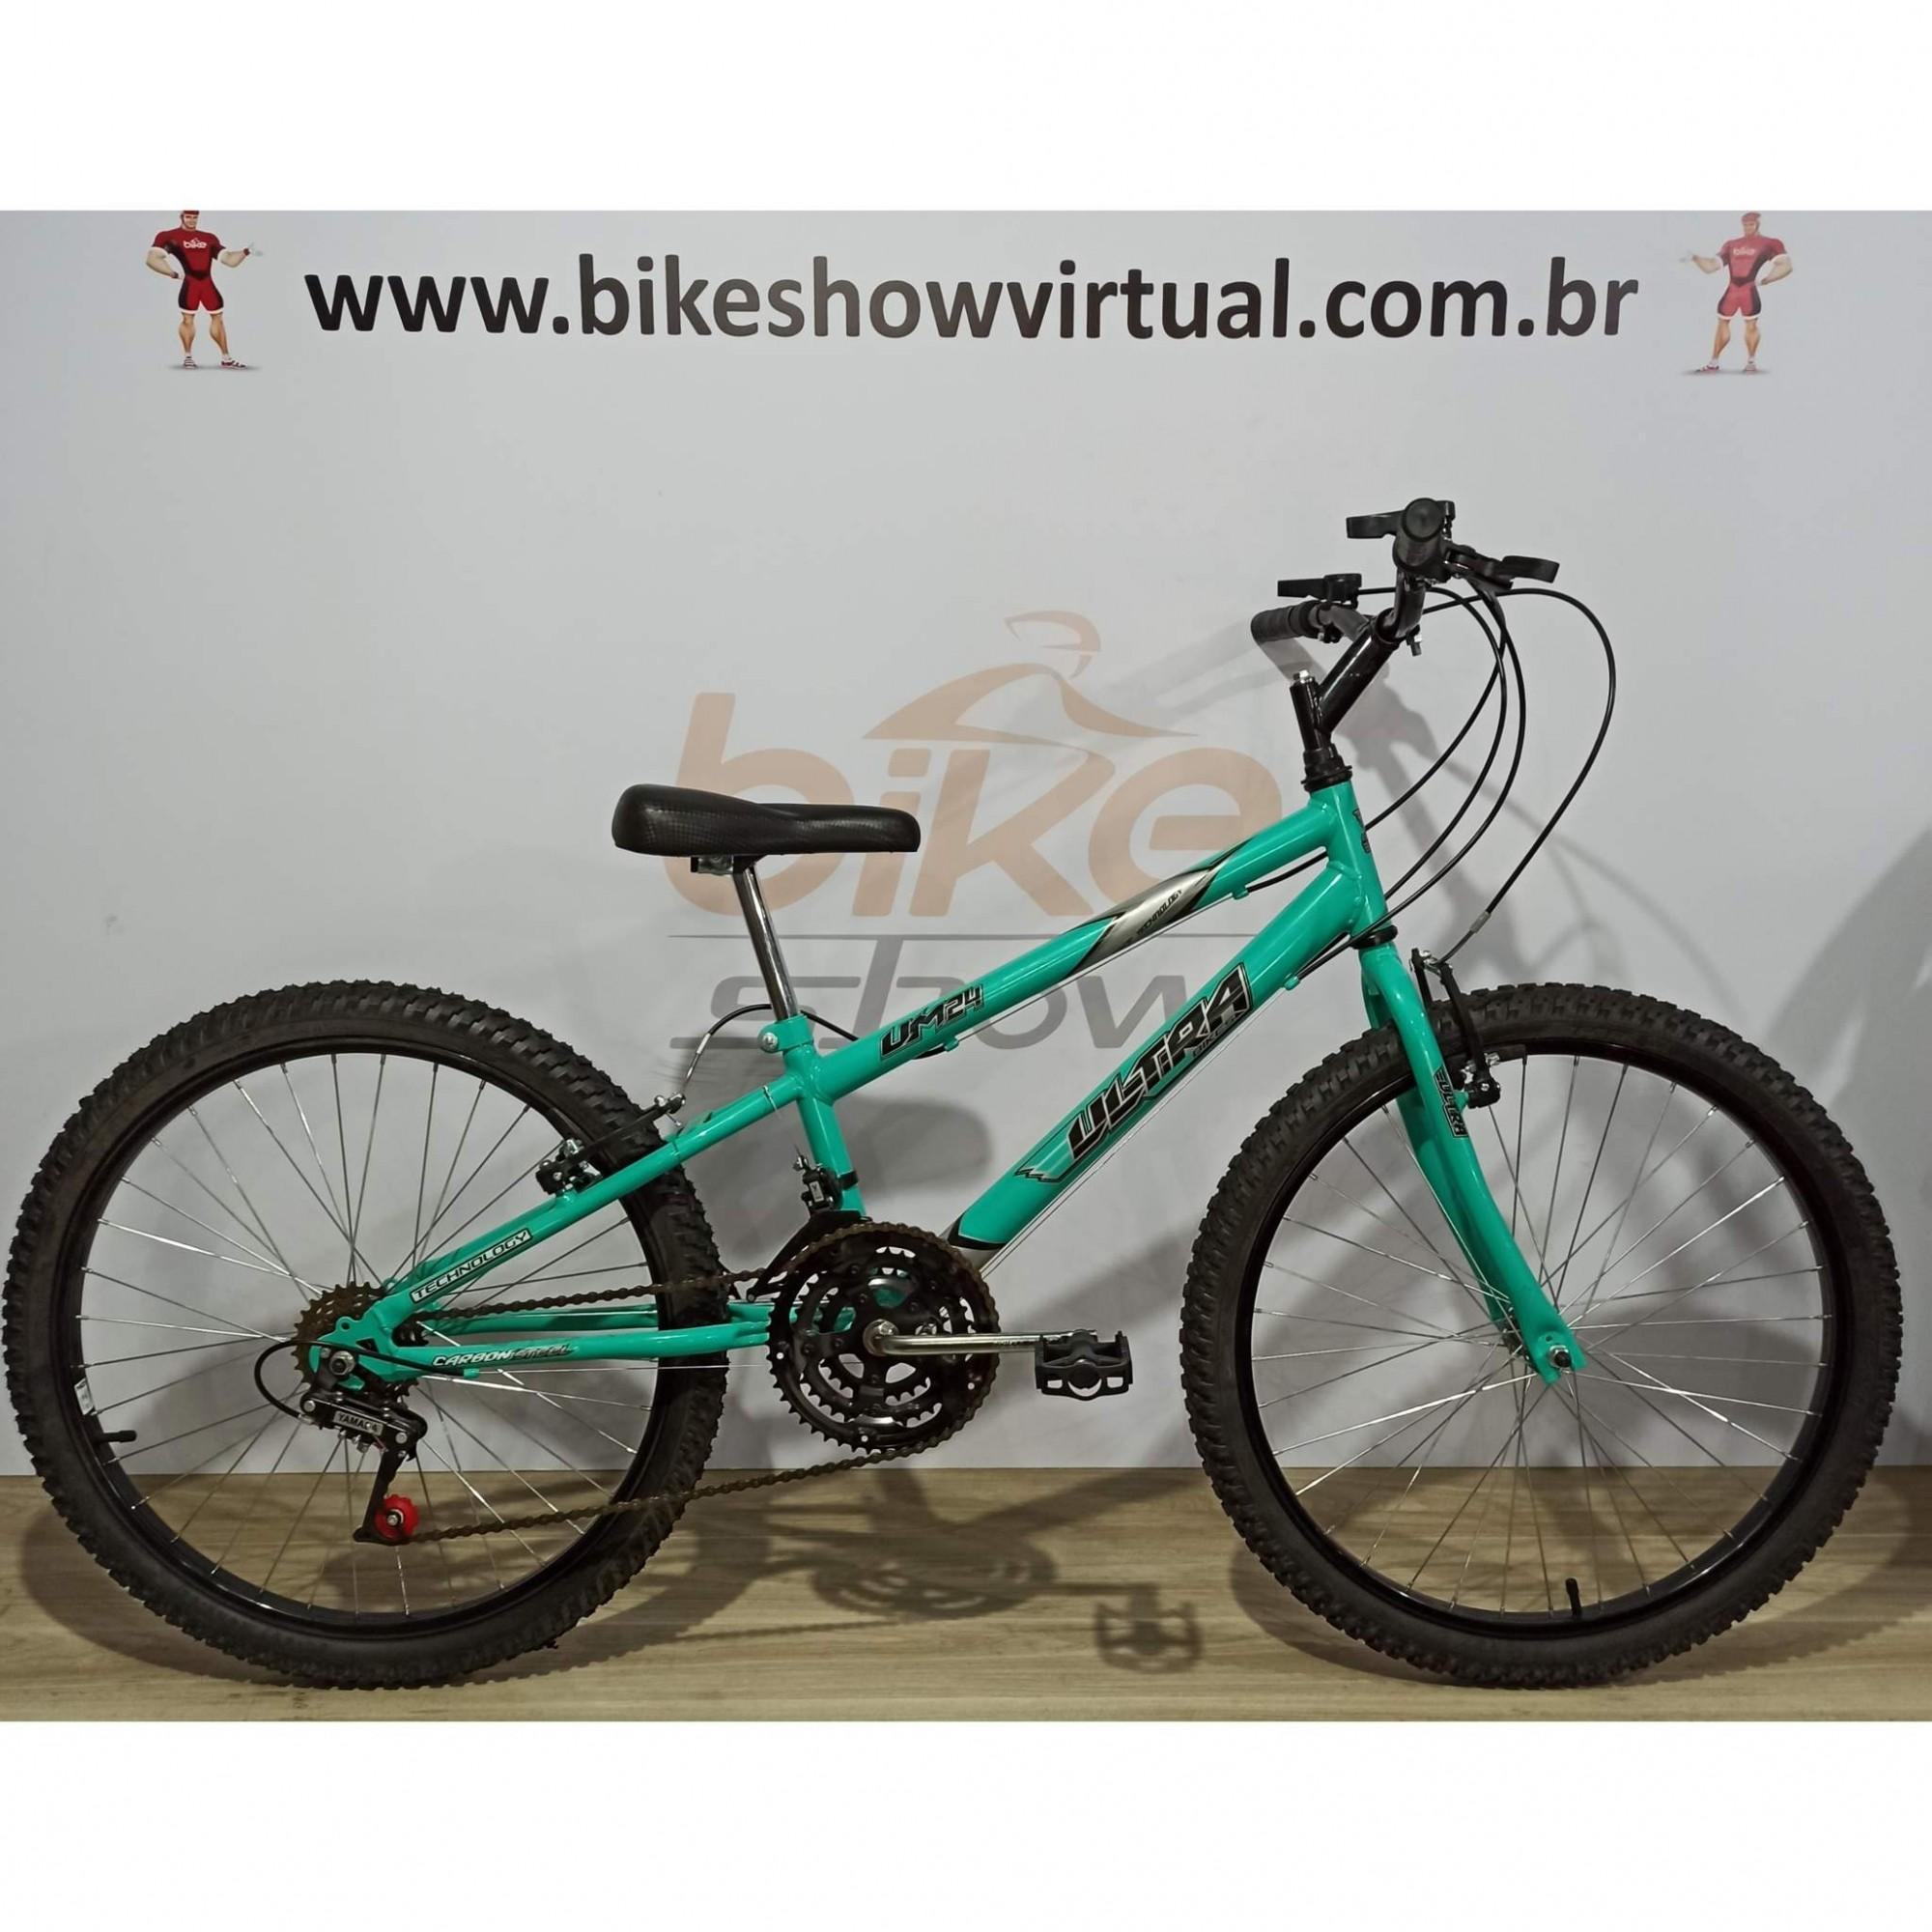 Bicicleta ULTRA BIKES aro 24 - 18v Yamada - Quadro Rebaixado